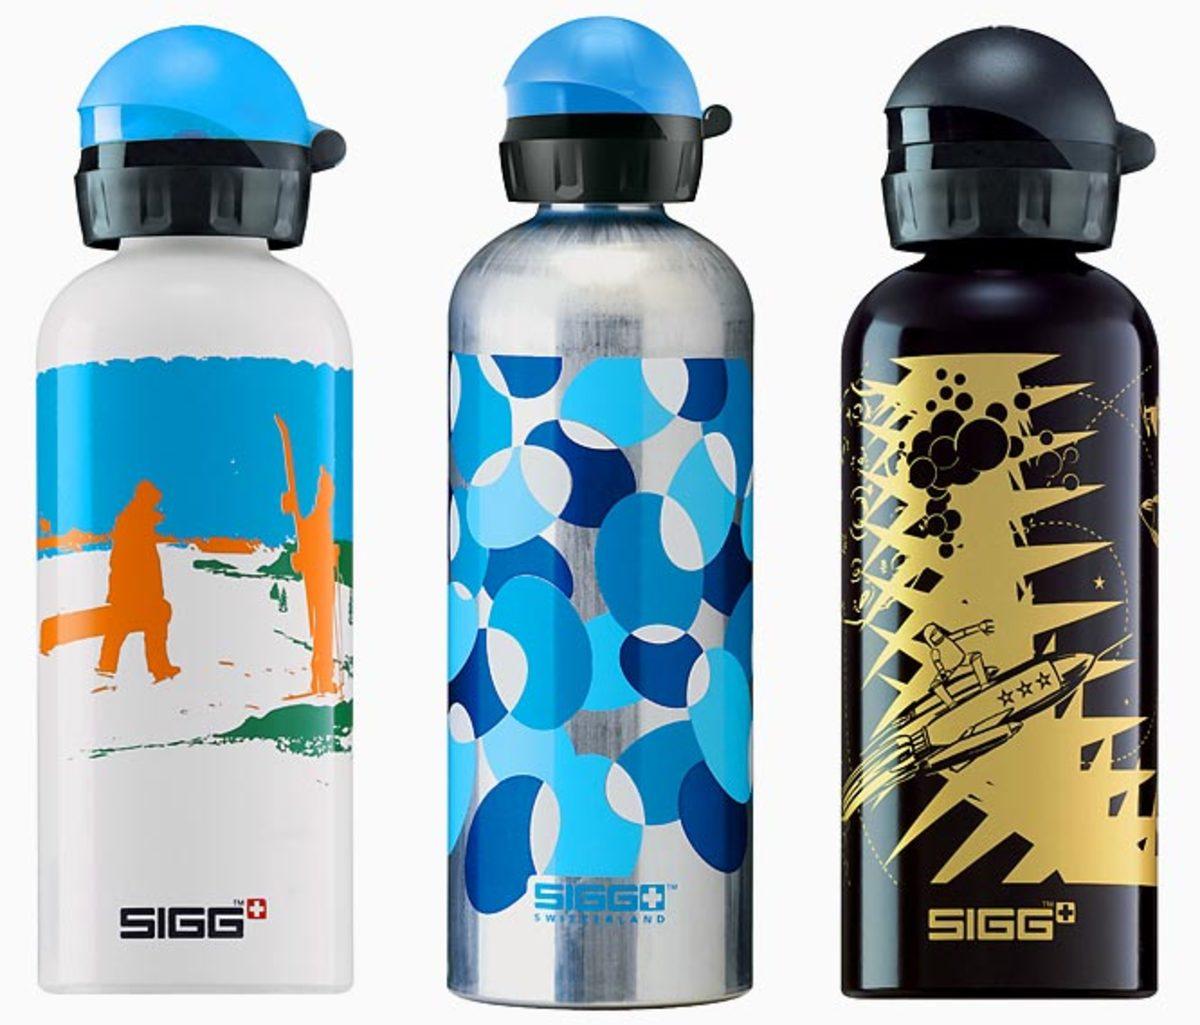 SIGG - Swiss Engineered Water Bottles